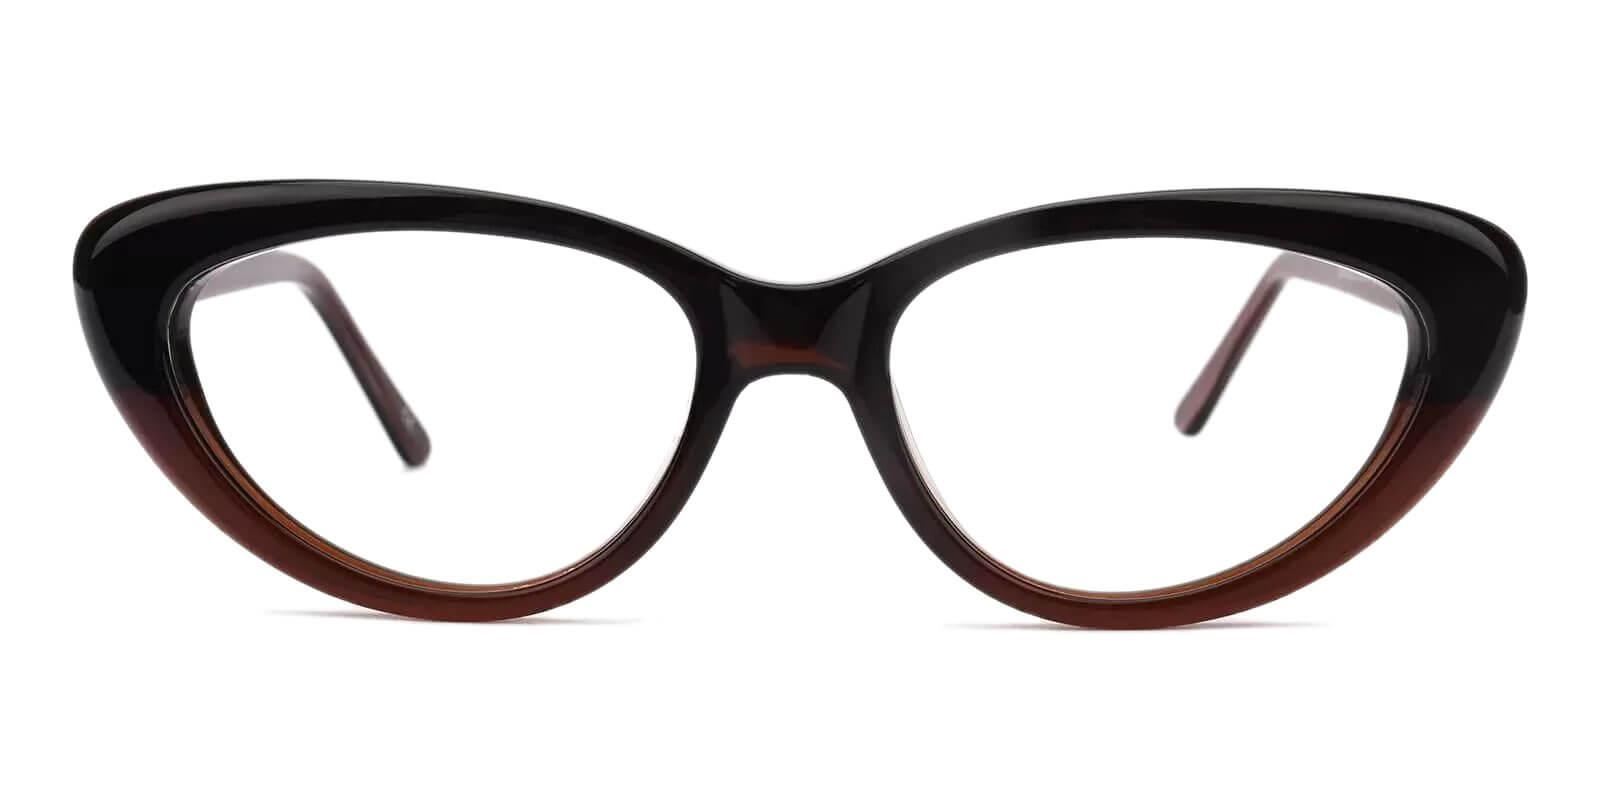 Stella Brown Acetate Eyeglasses , SpringHinges , UniversalBridgeFit Frames from ABBE Glasses